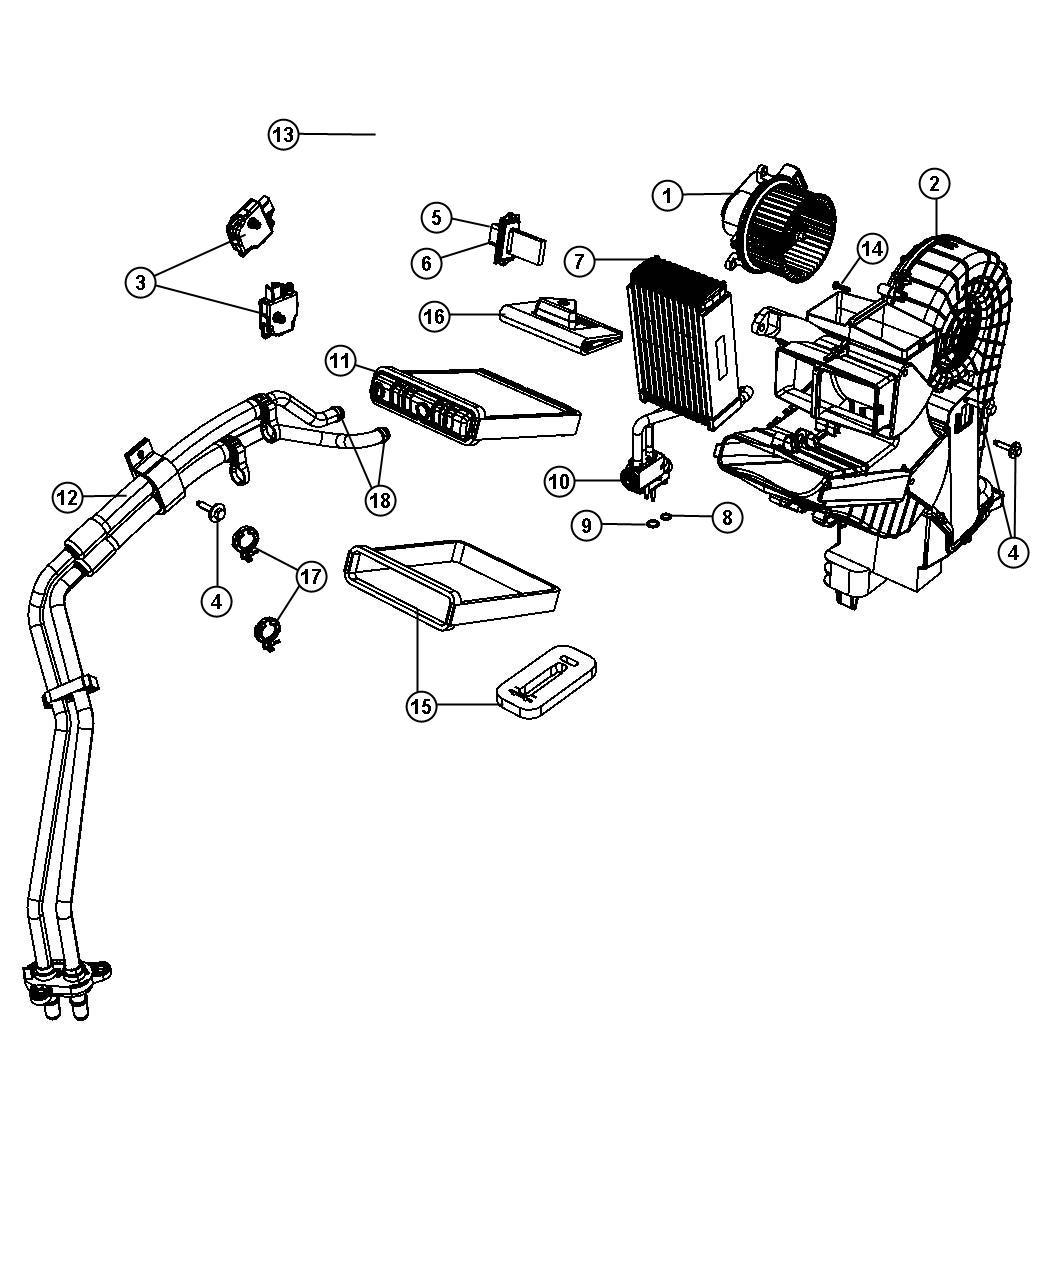 2009 Dodge Grand Caravan Plate. Evaporator. Zone, temp